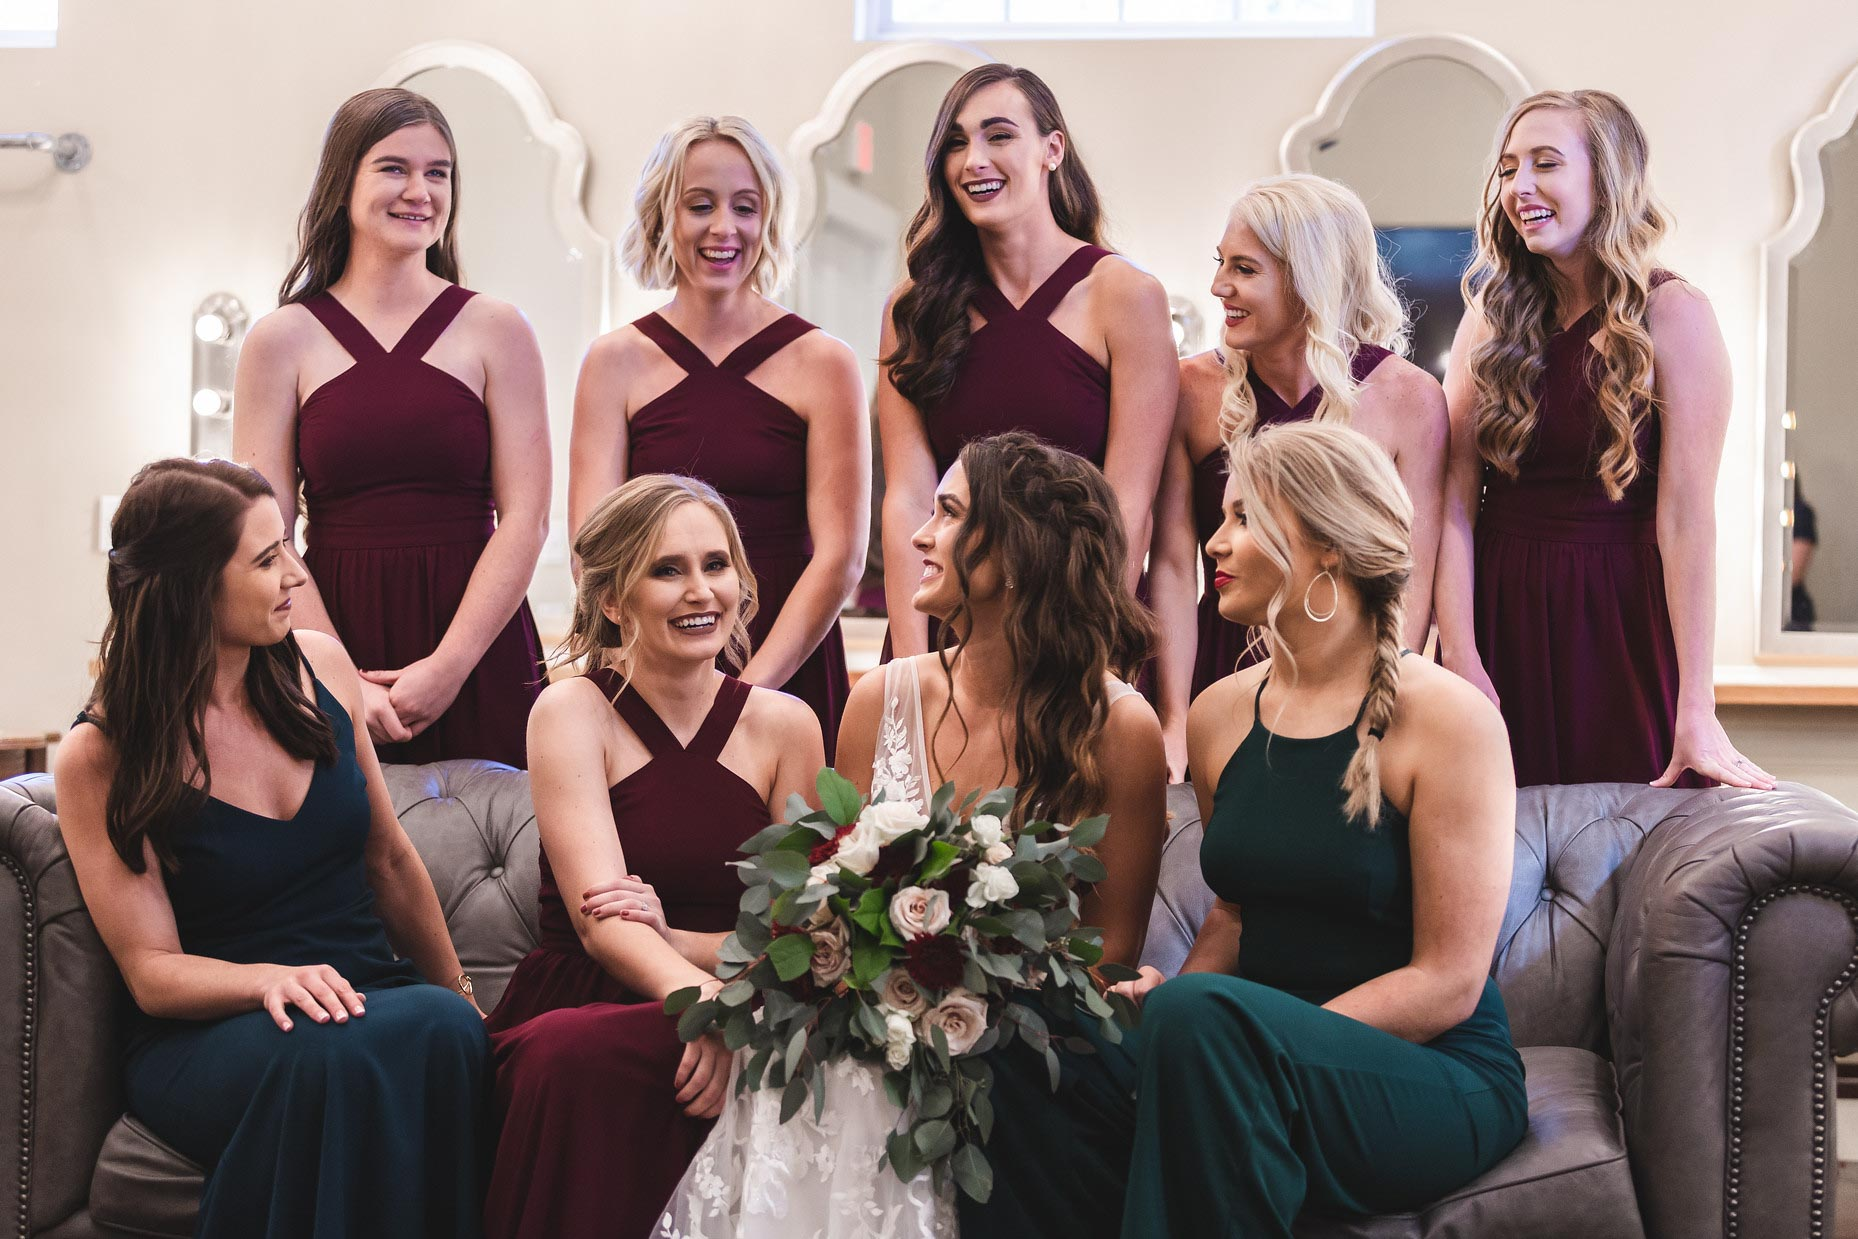 adam-szarmack-bowing-oaks-wedding-photographer-jacksonville-44.jpg